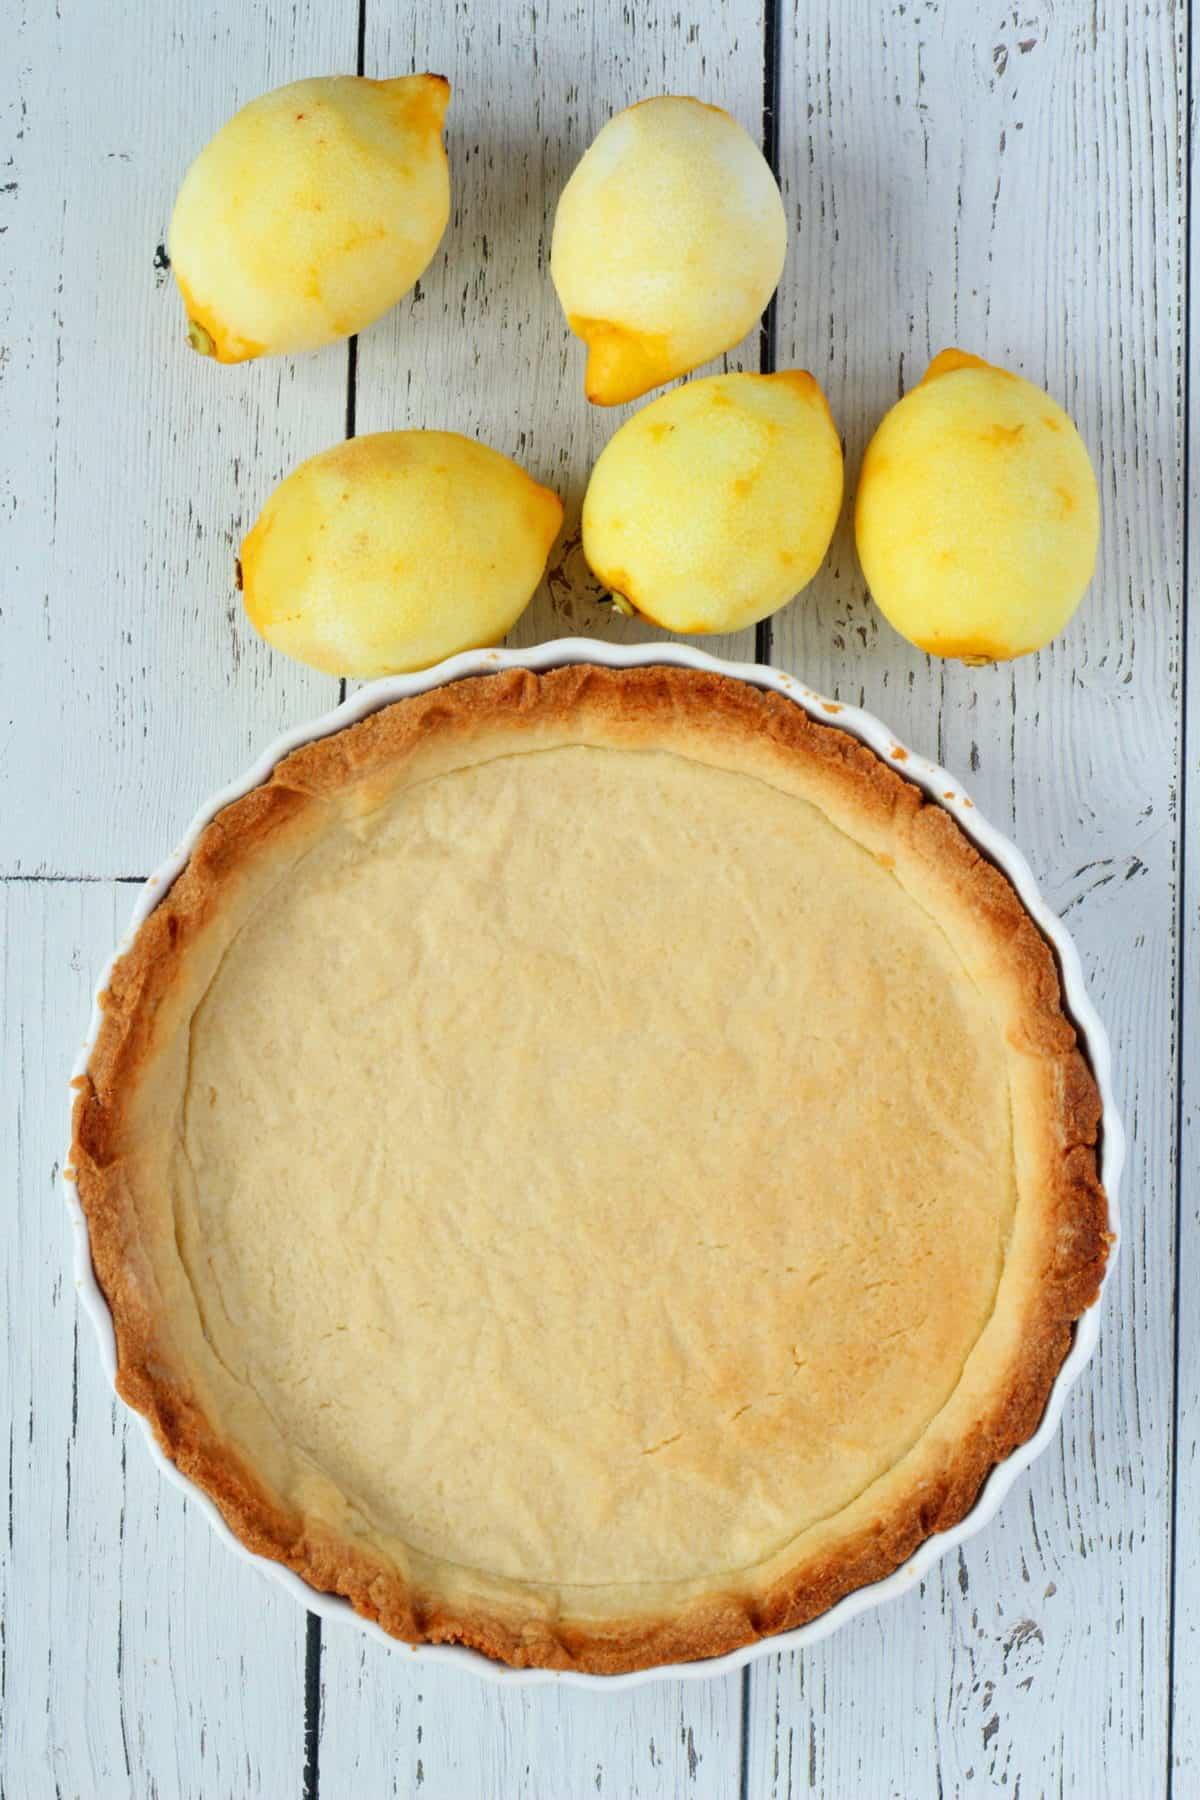 Lemon tart sprinkled with sugar in white dish